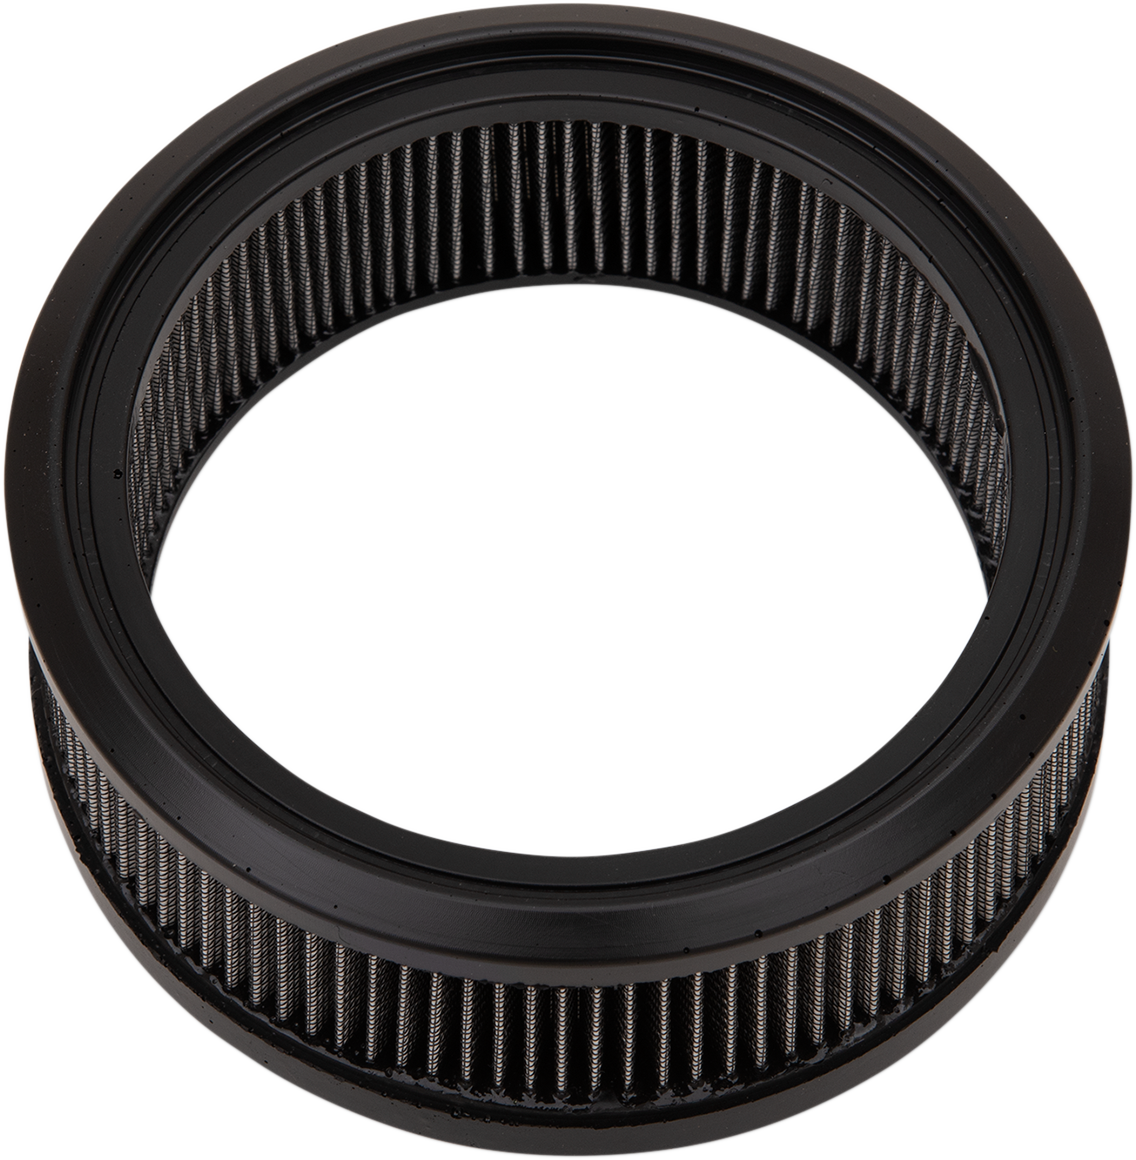 Drag Specialties Replacement S&S Super D Carburetor Air Filter Cleaner Element